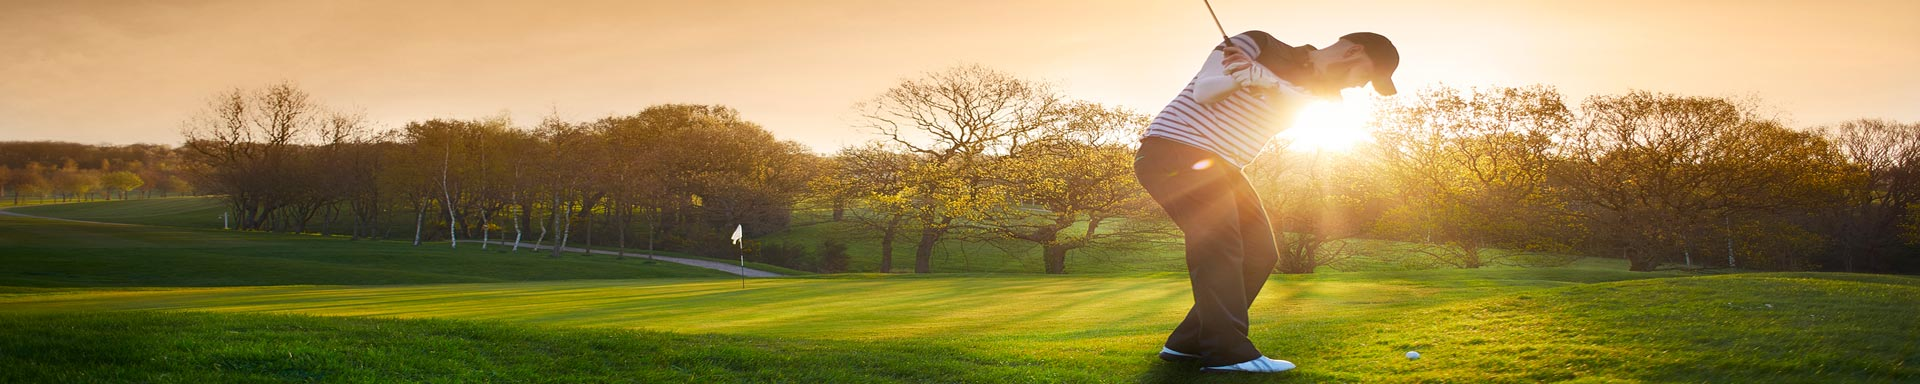 Golfplatz2 1920x384